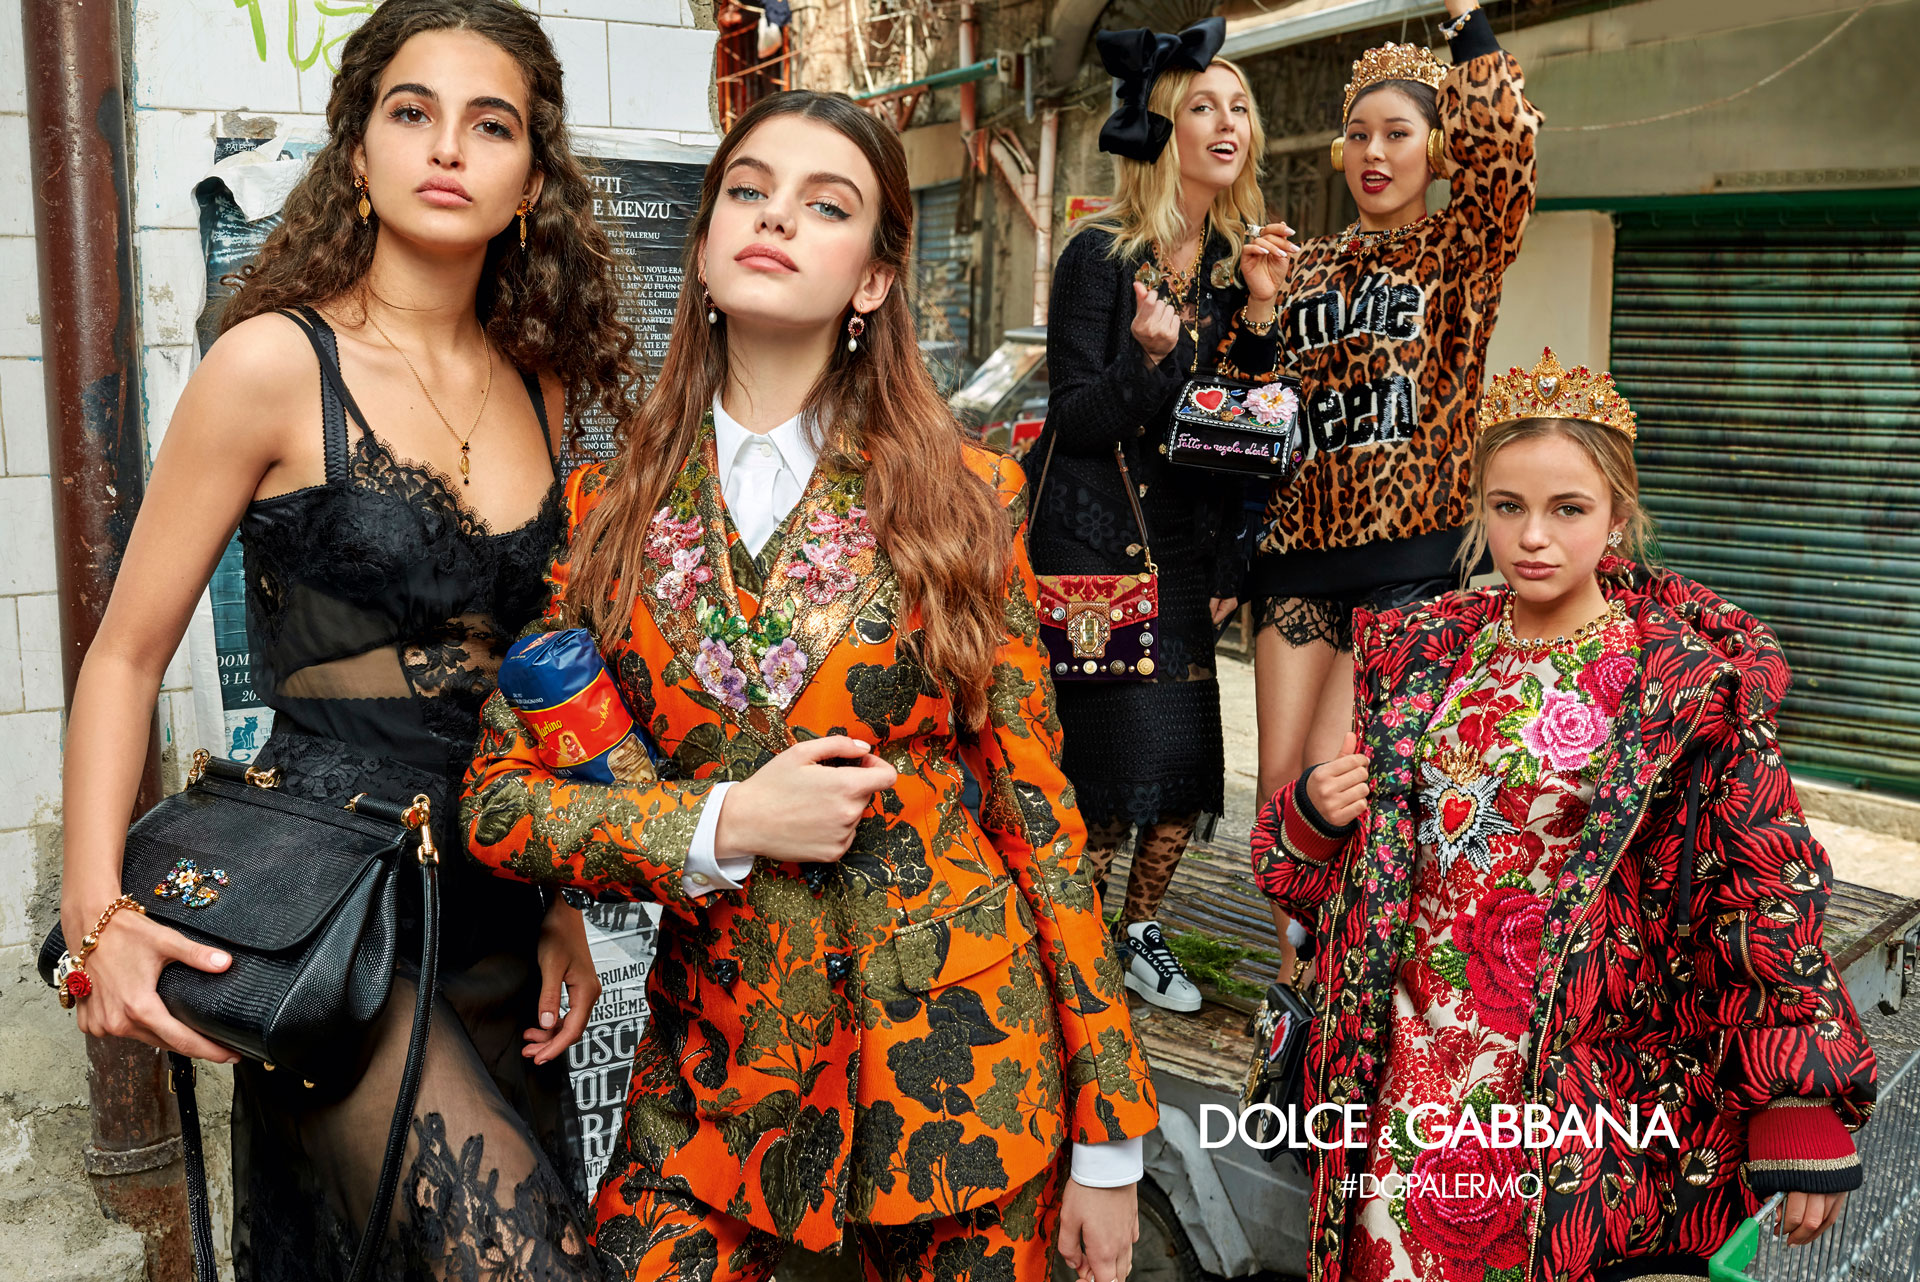 Dolce & Gabbana Fall 2017 Ad Campaign - The Impression